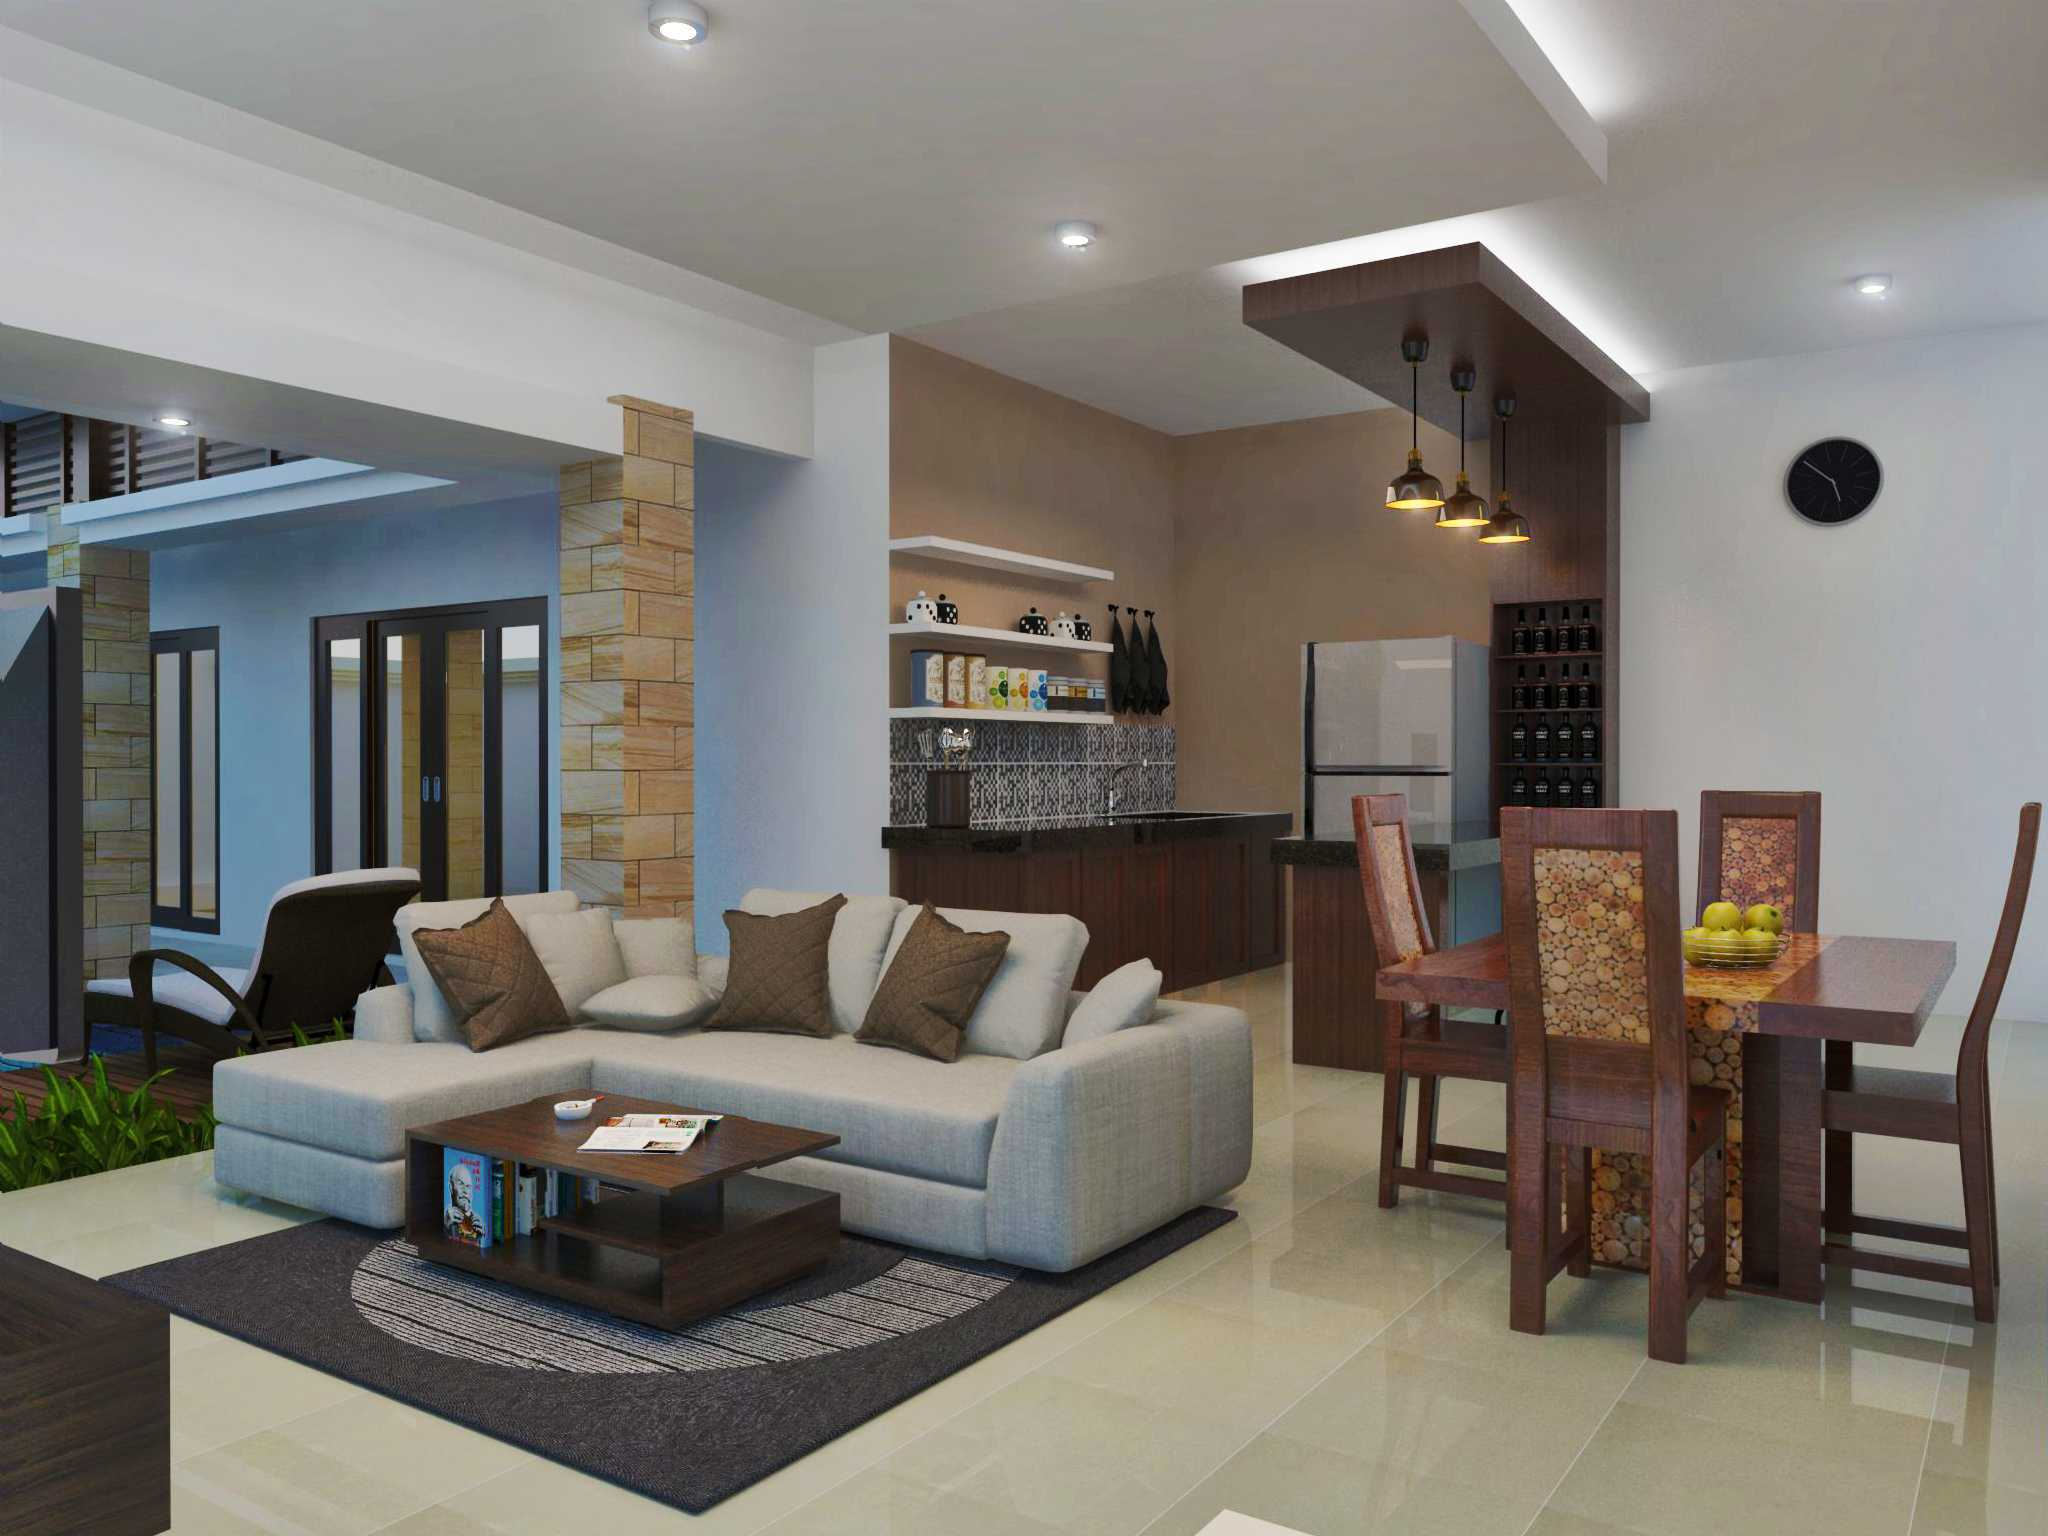 Arsatama Architect Langkung Villa`s - Bali Gianyar, Gianyar Sub-District, Gianyar, Bali, Indonesia Bali, Indonesia Living-Roomlangkung-Villas   23621